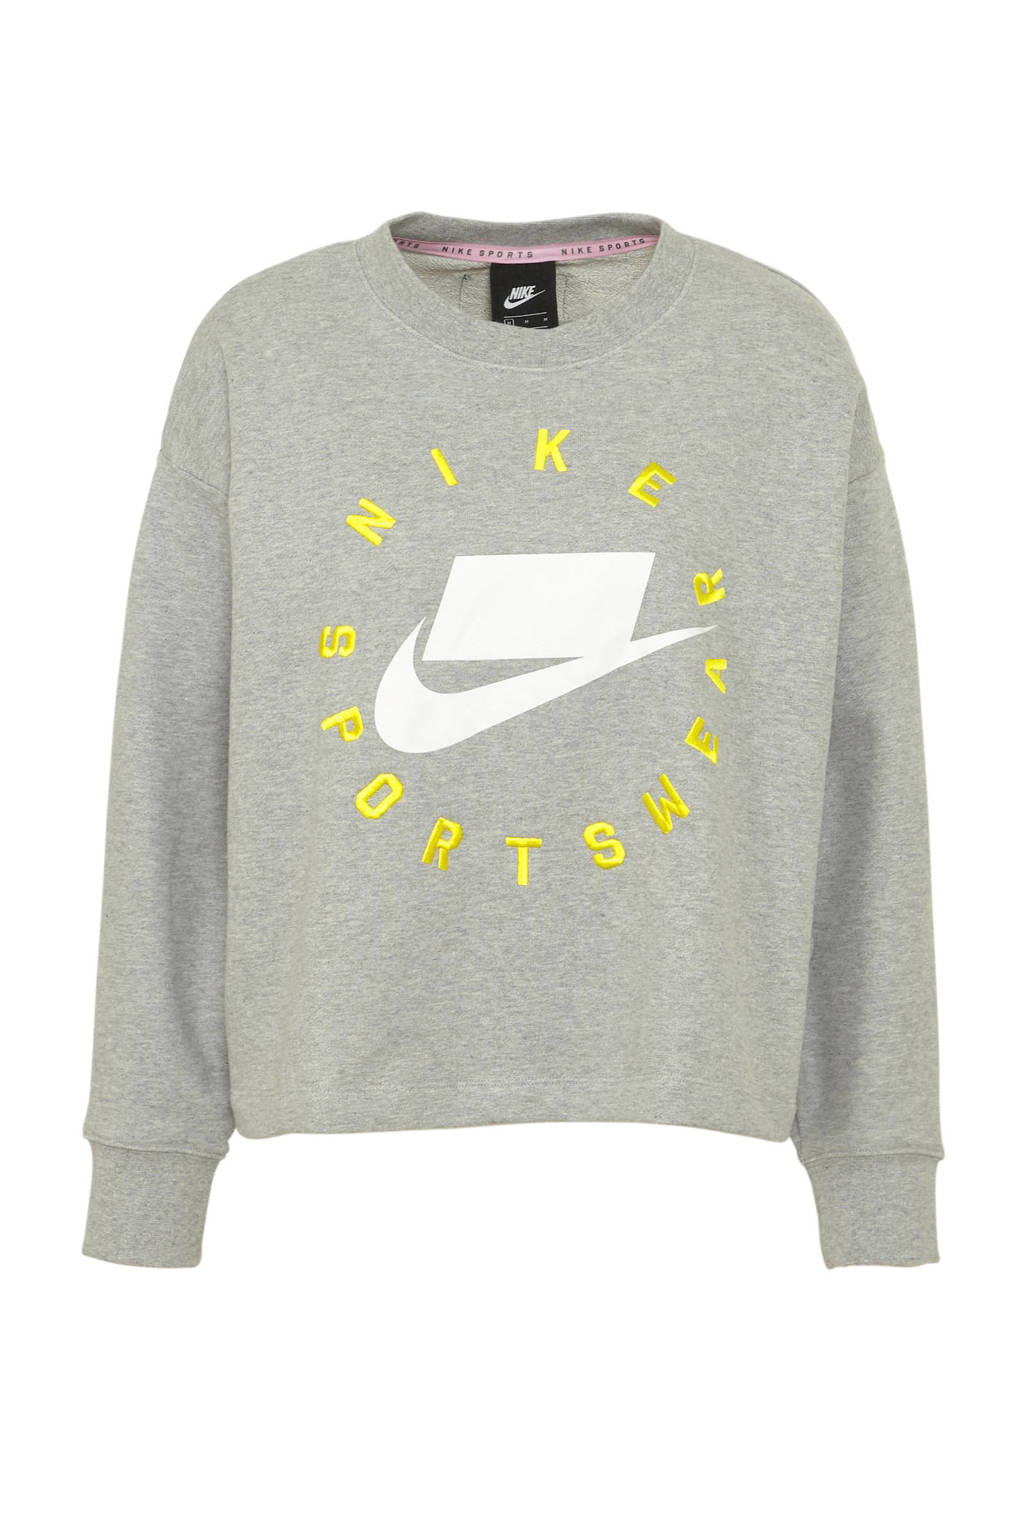 f9c5a1ff237 Nike sweater grijs melange, Grijs melange/geel